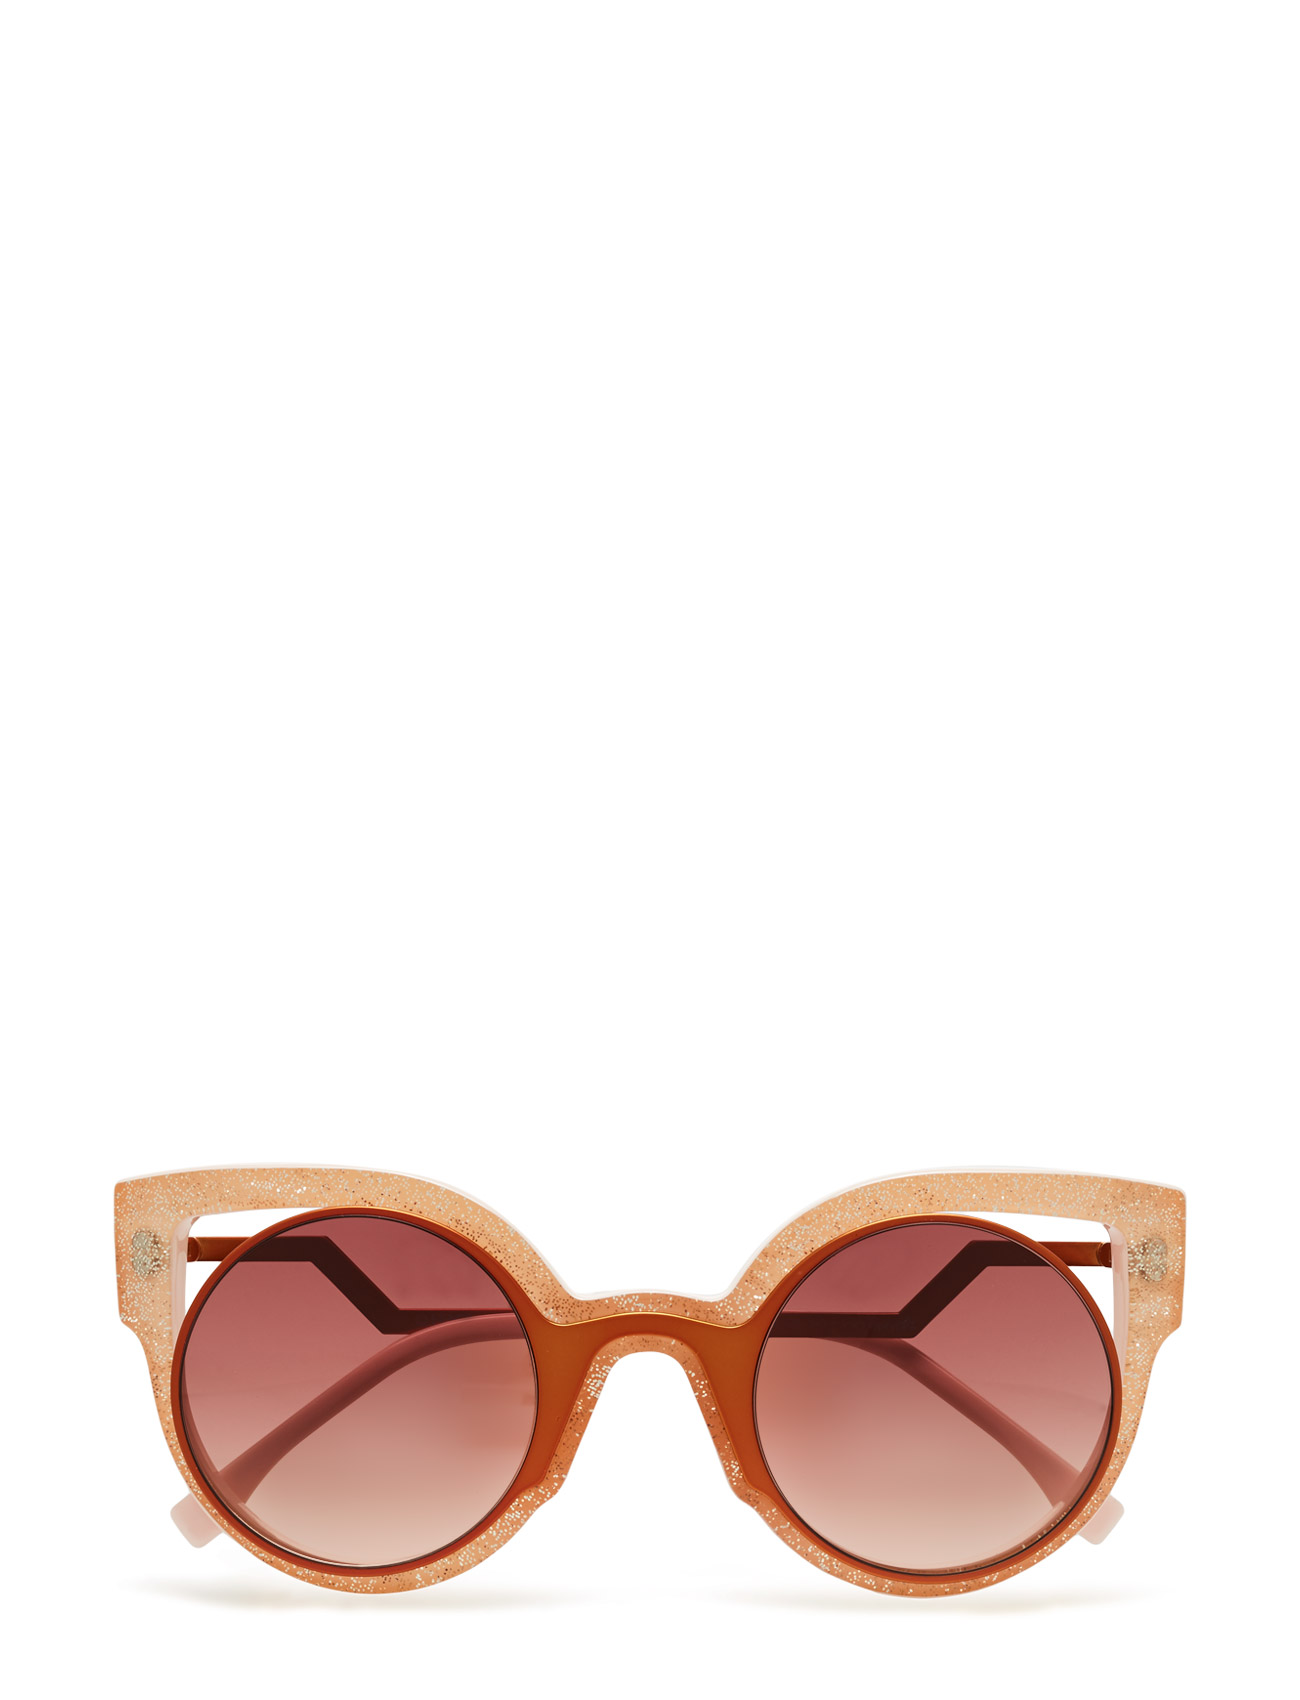 fendi sunglasses 223640 fra boozt.com dk